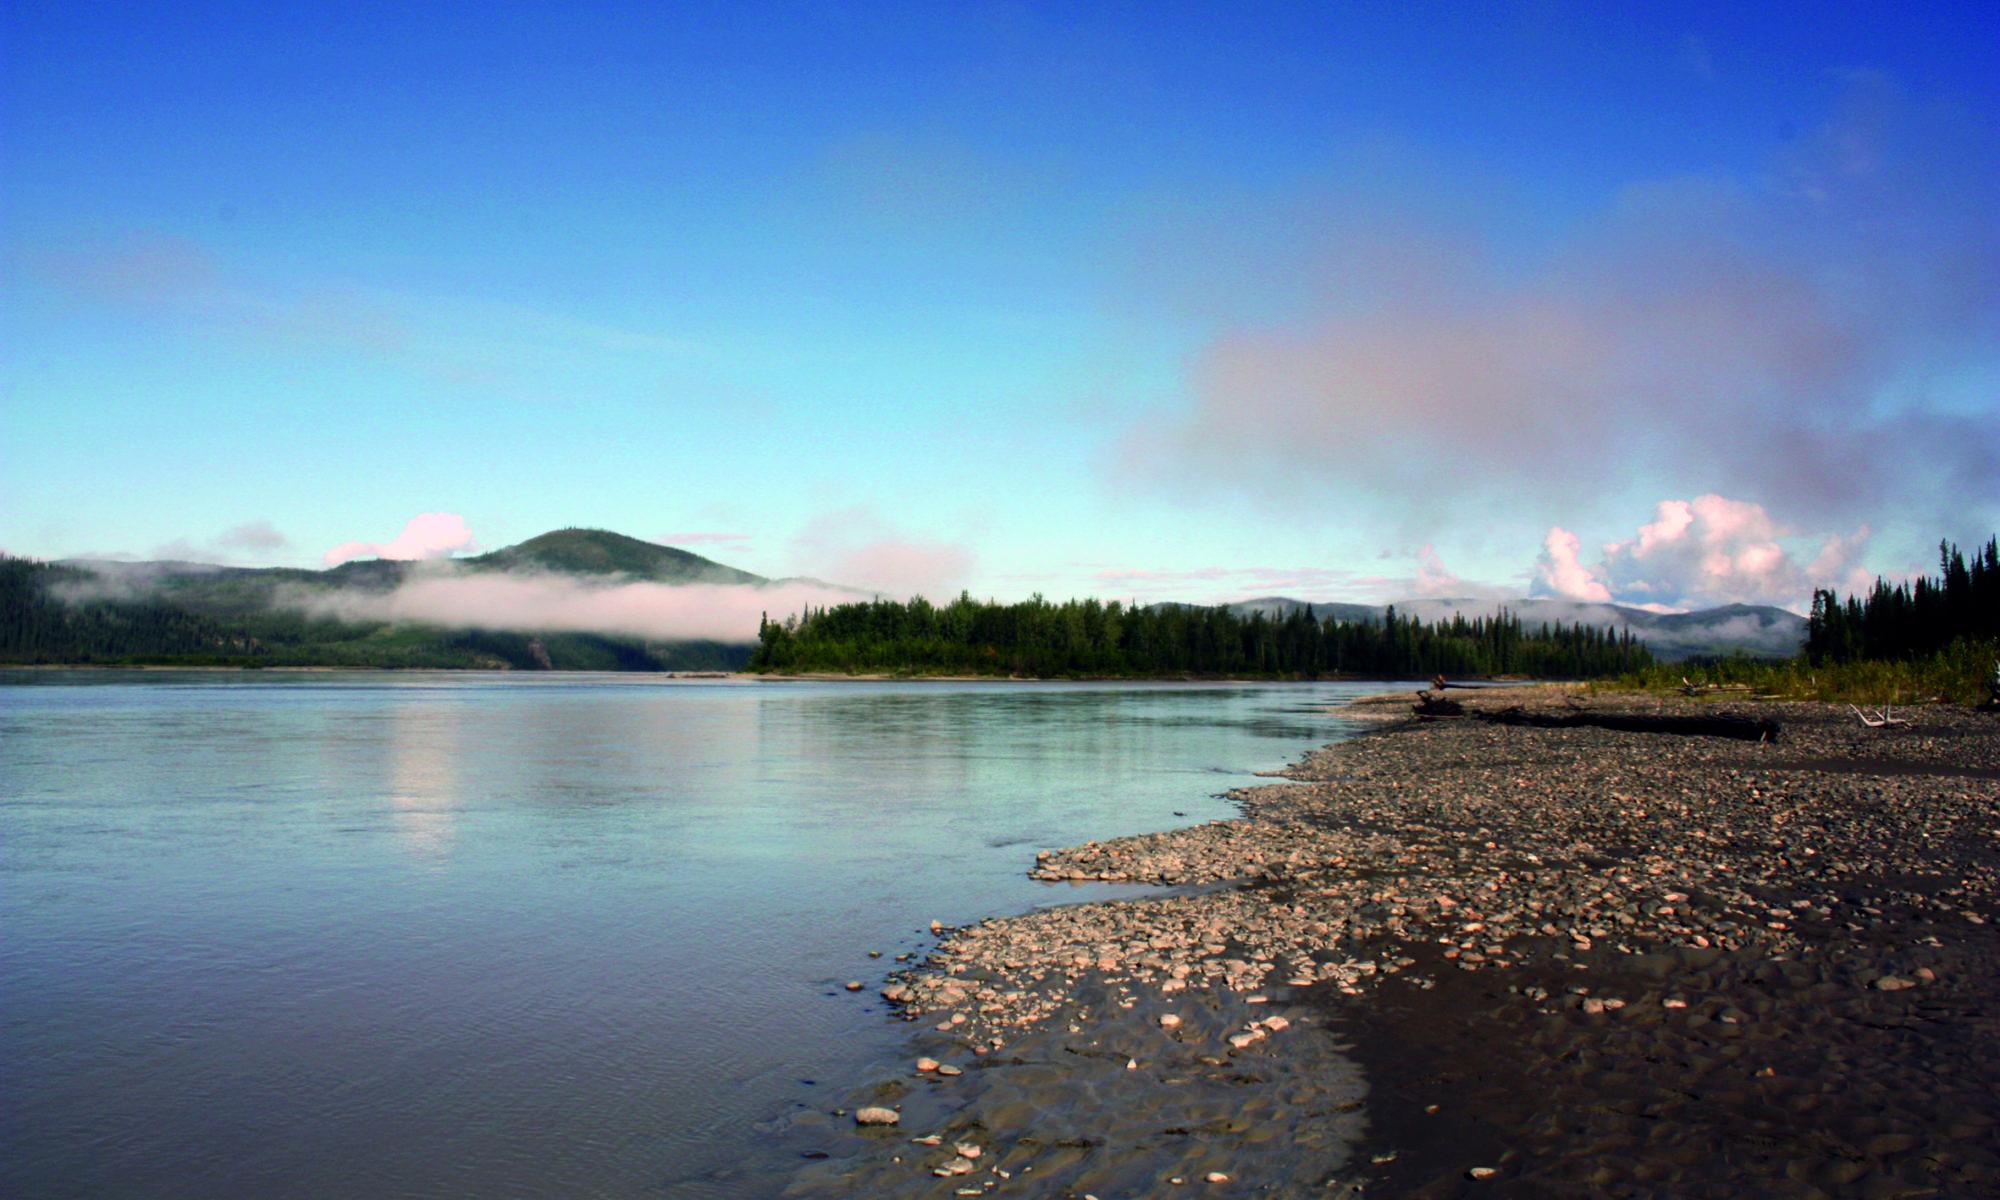 Viktor J. Stern: Reiseerlebnisse/Indianer/Northern Affairs